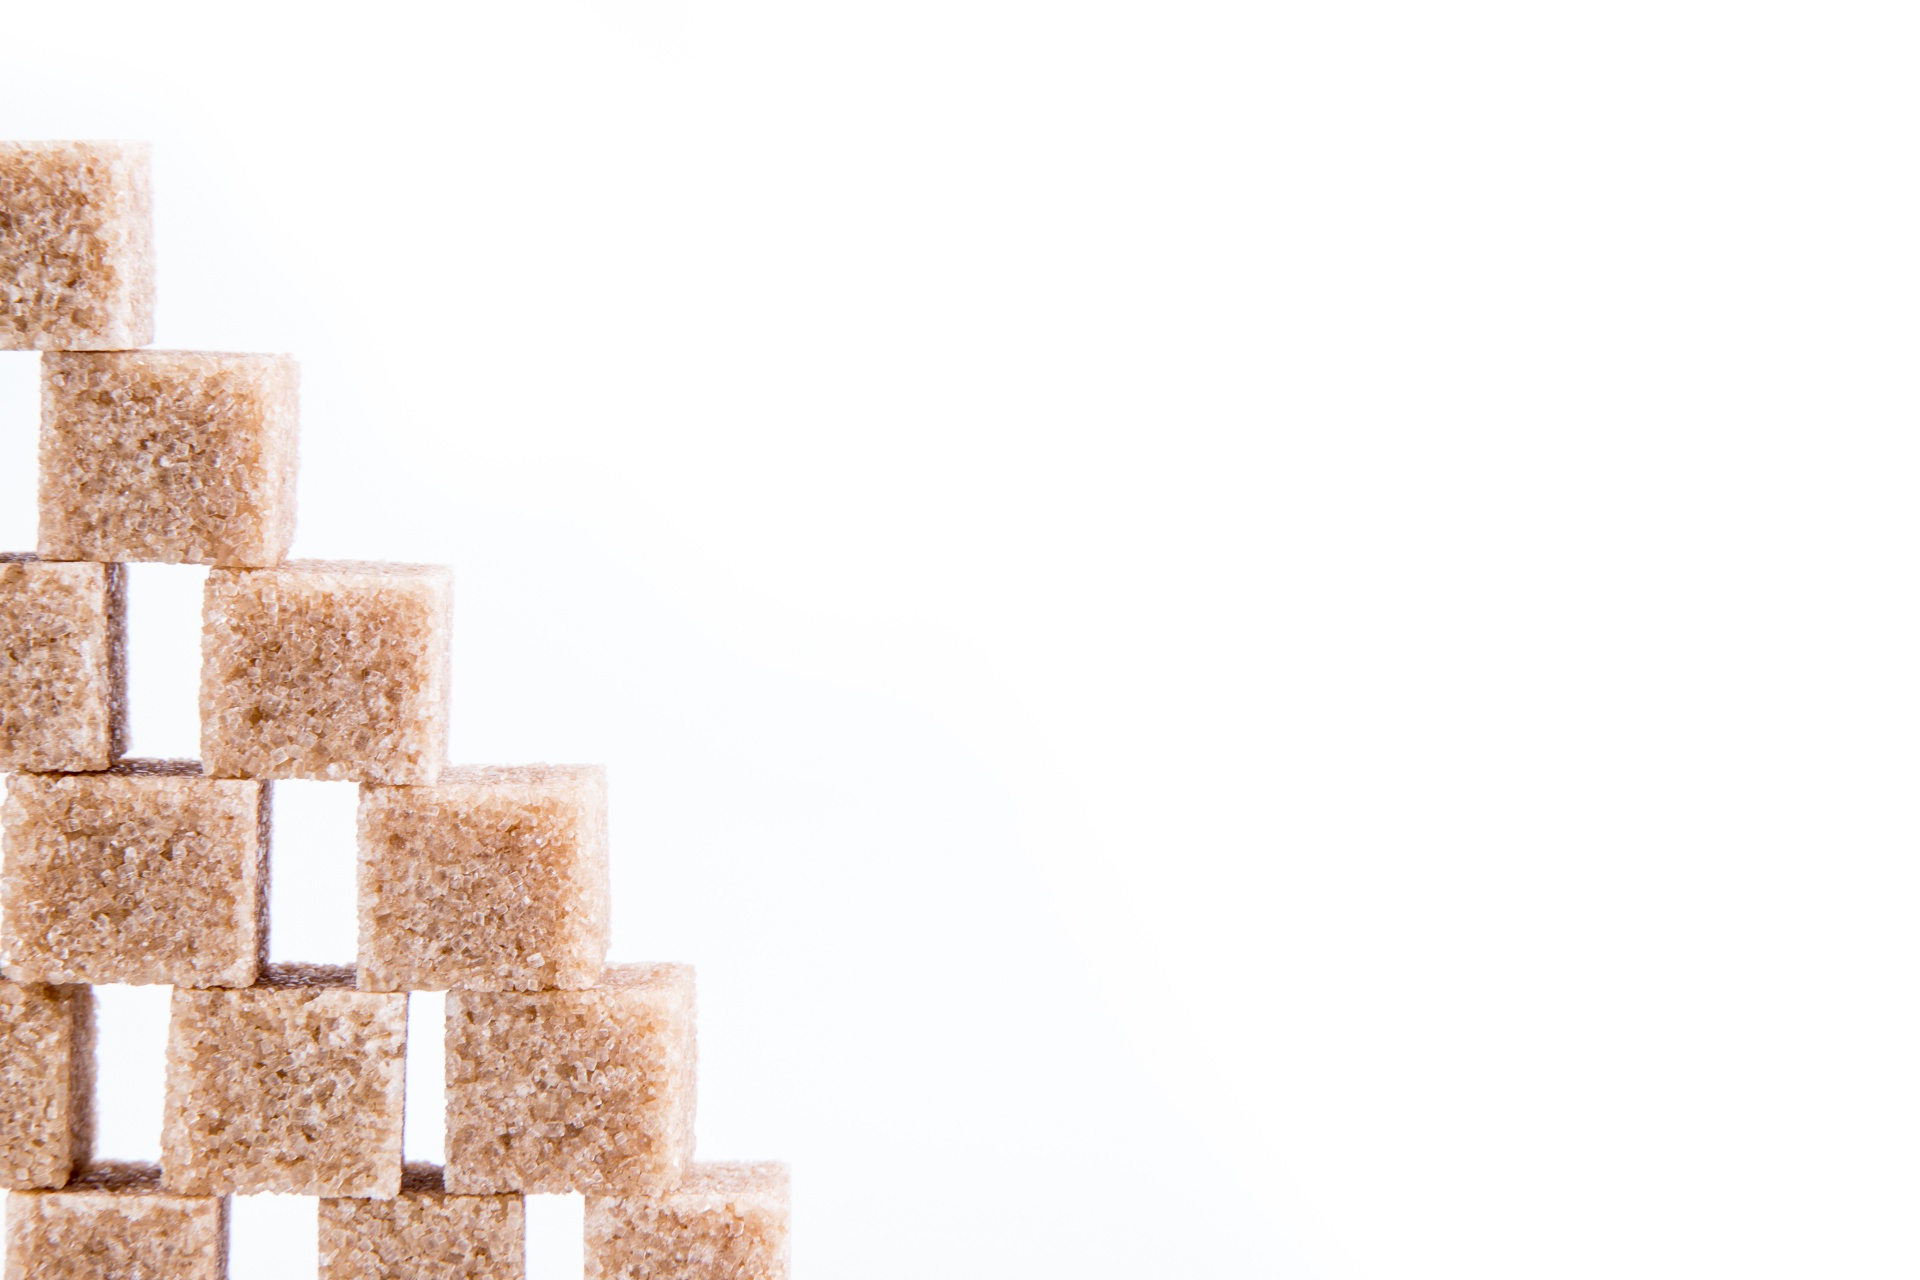 Muro di zollette di zucchero